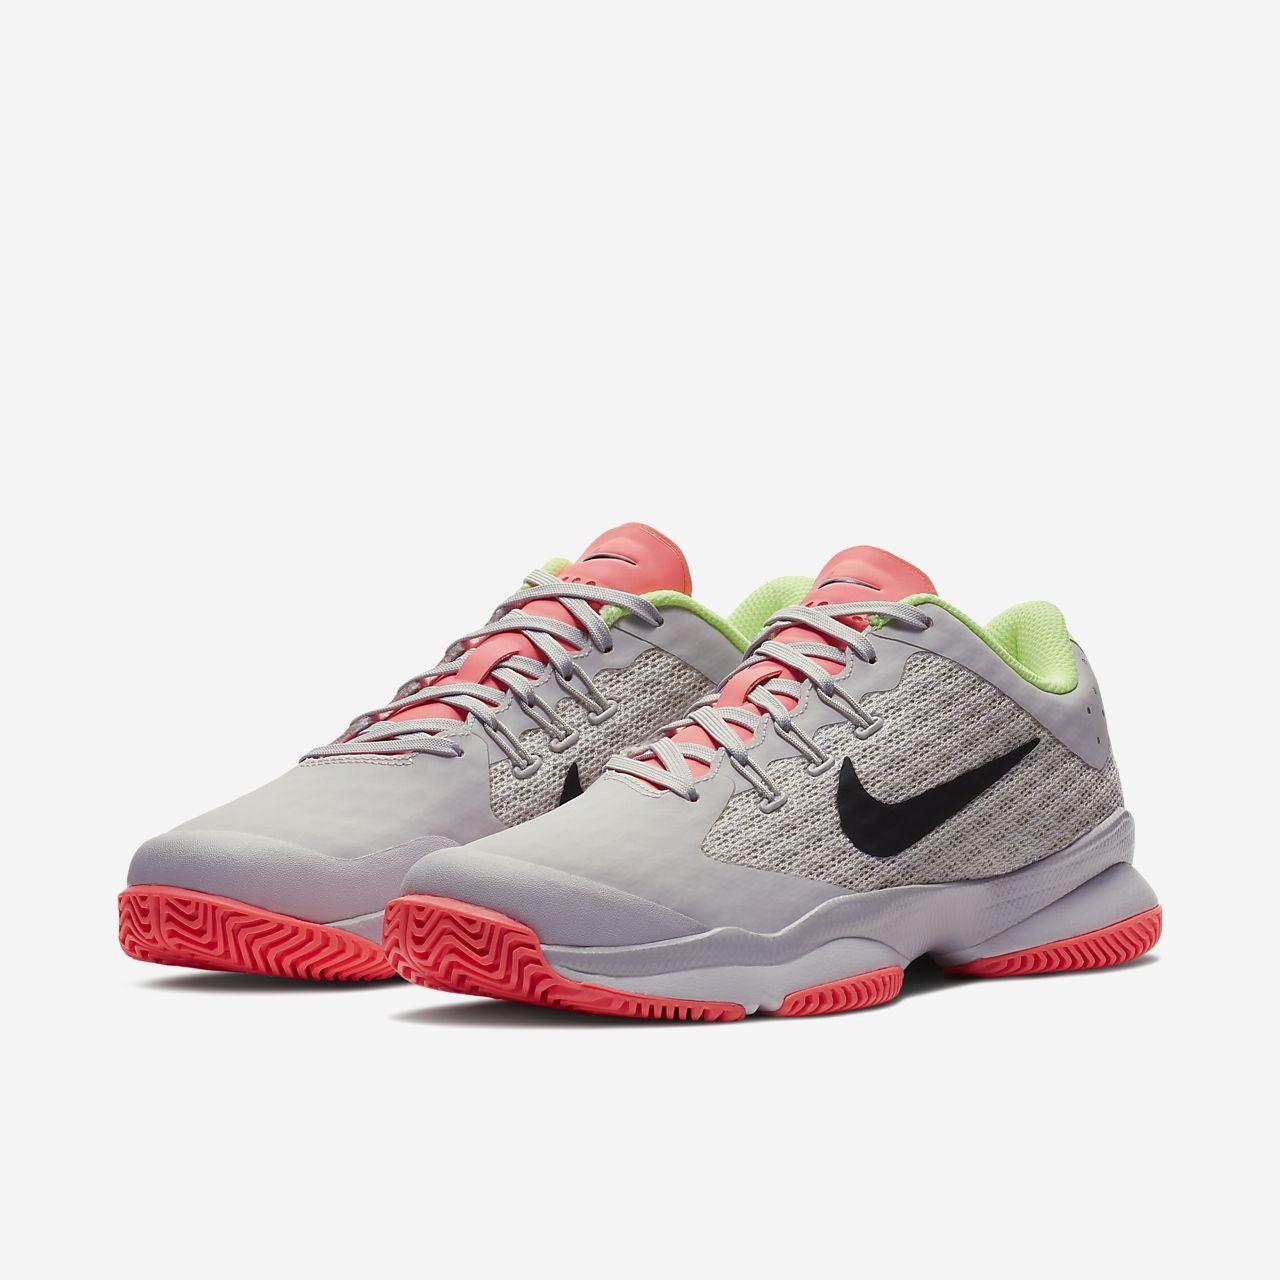 2902359197310 NikeCourt Air Zoom Ultra Hard Court Women s Tennis Shoe